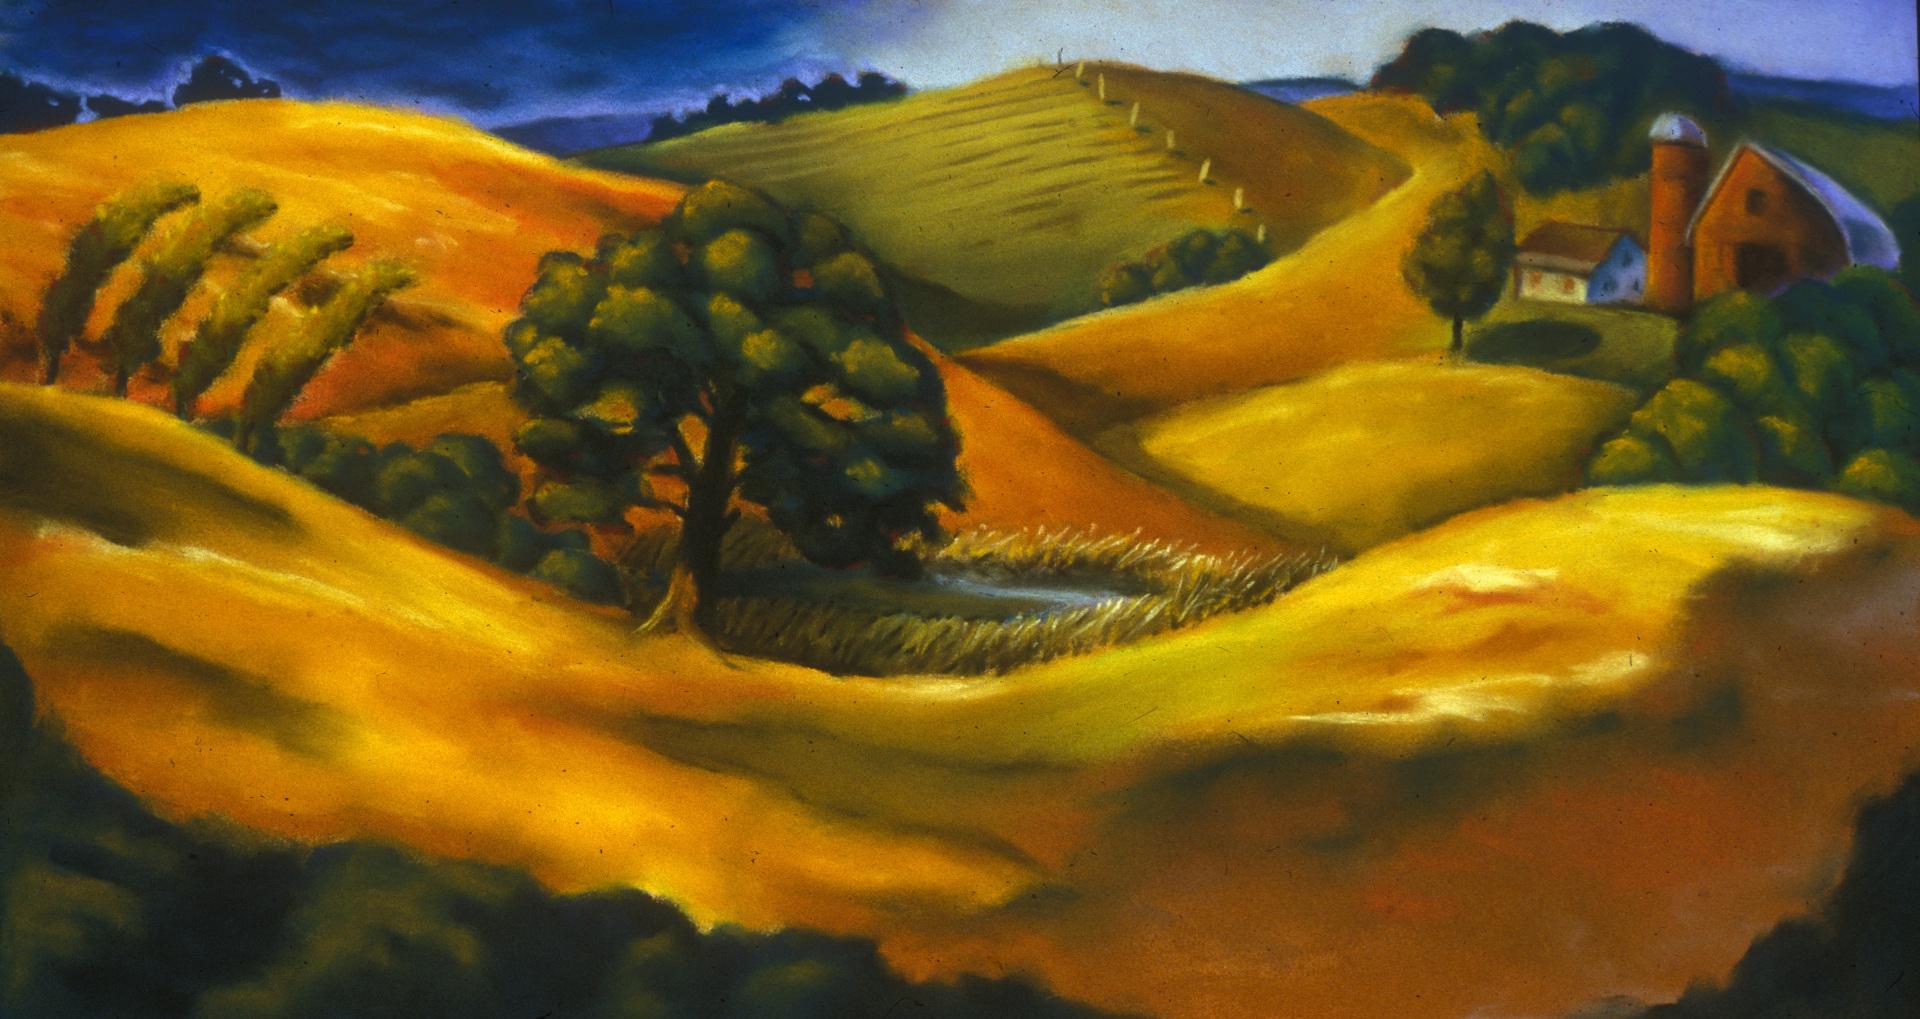 oak & the reeds